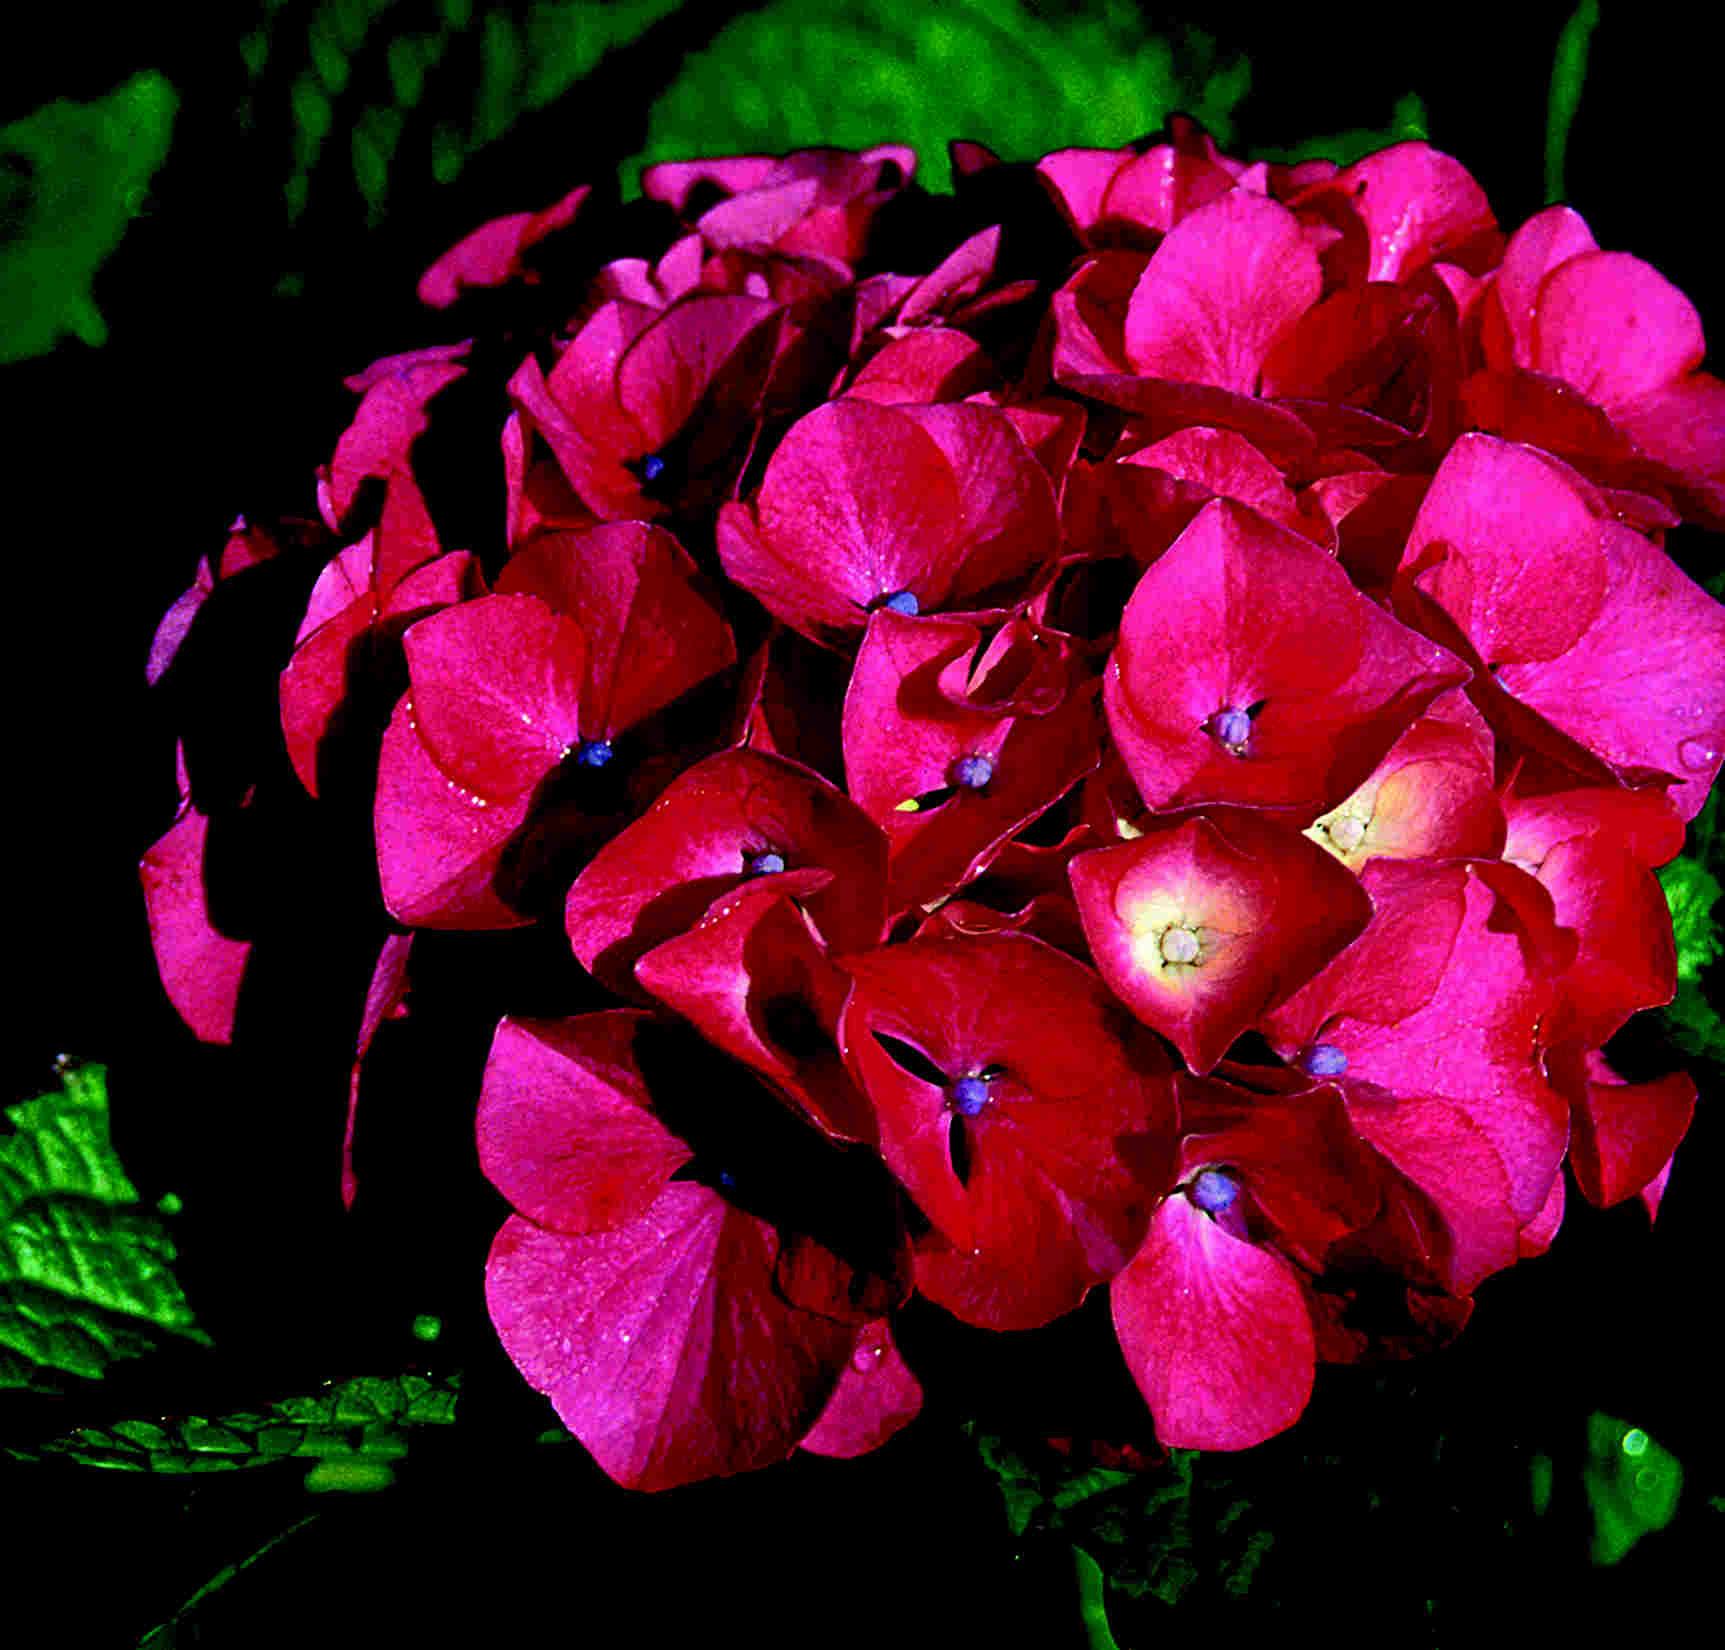 Ogrodkrotonpl Hortensja Ogrodowa Hot Red Hydrangea Macrophylla